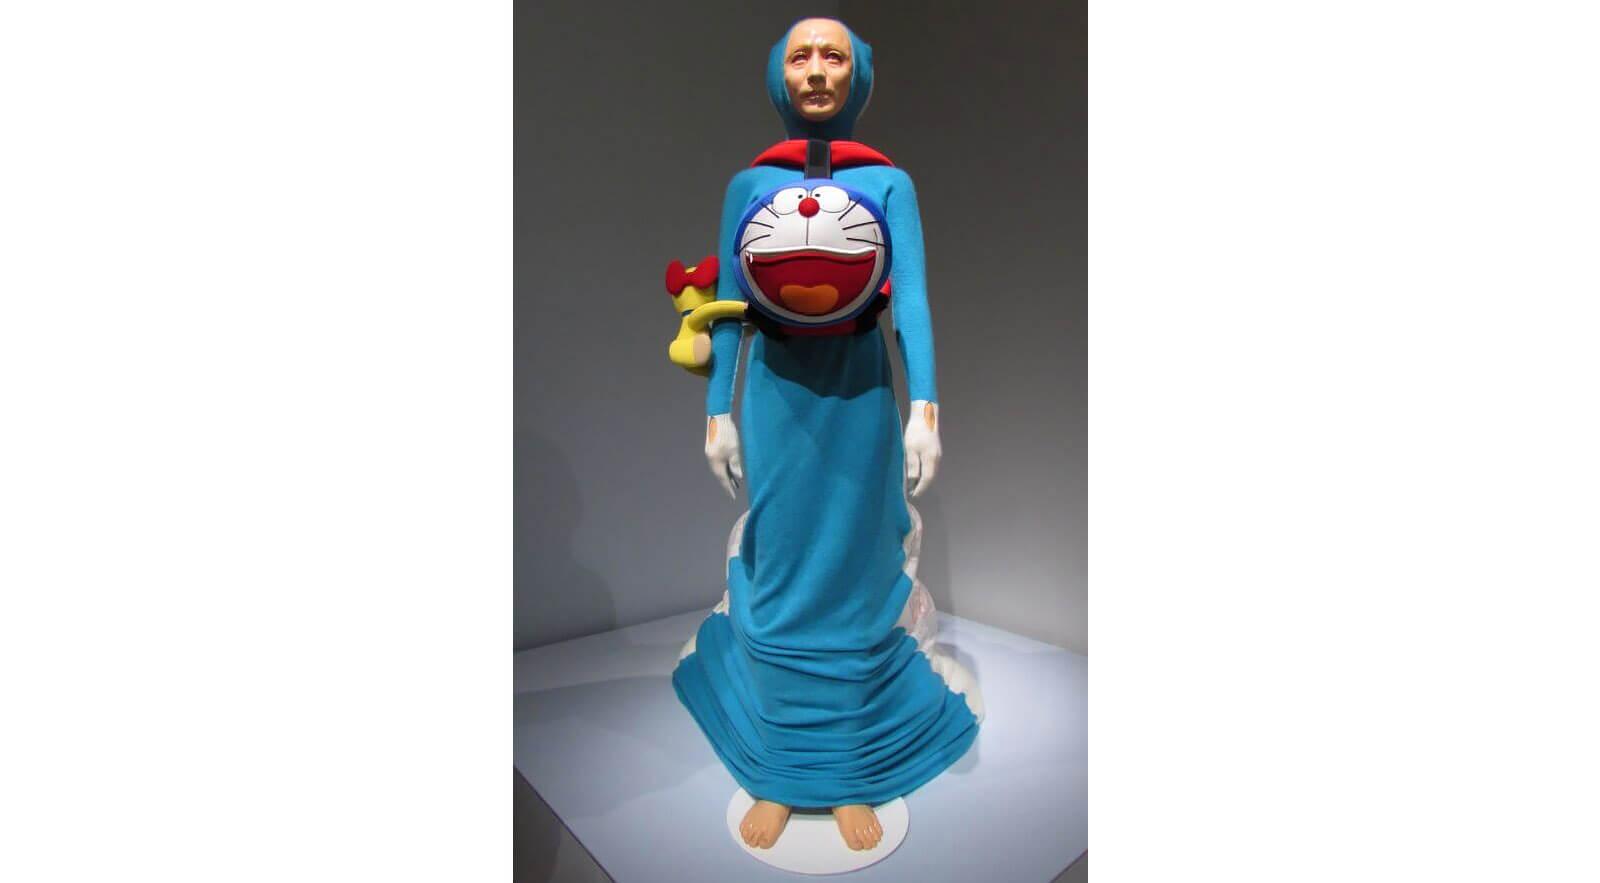 The Doraemon Exhibition - DORAS